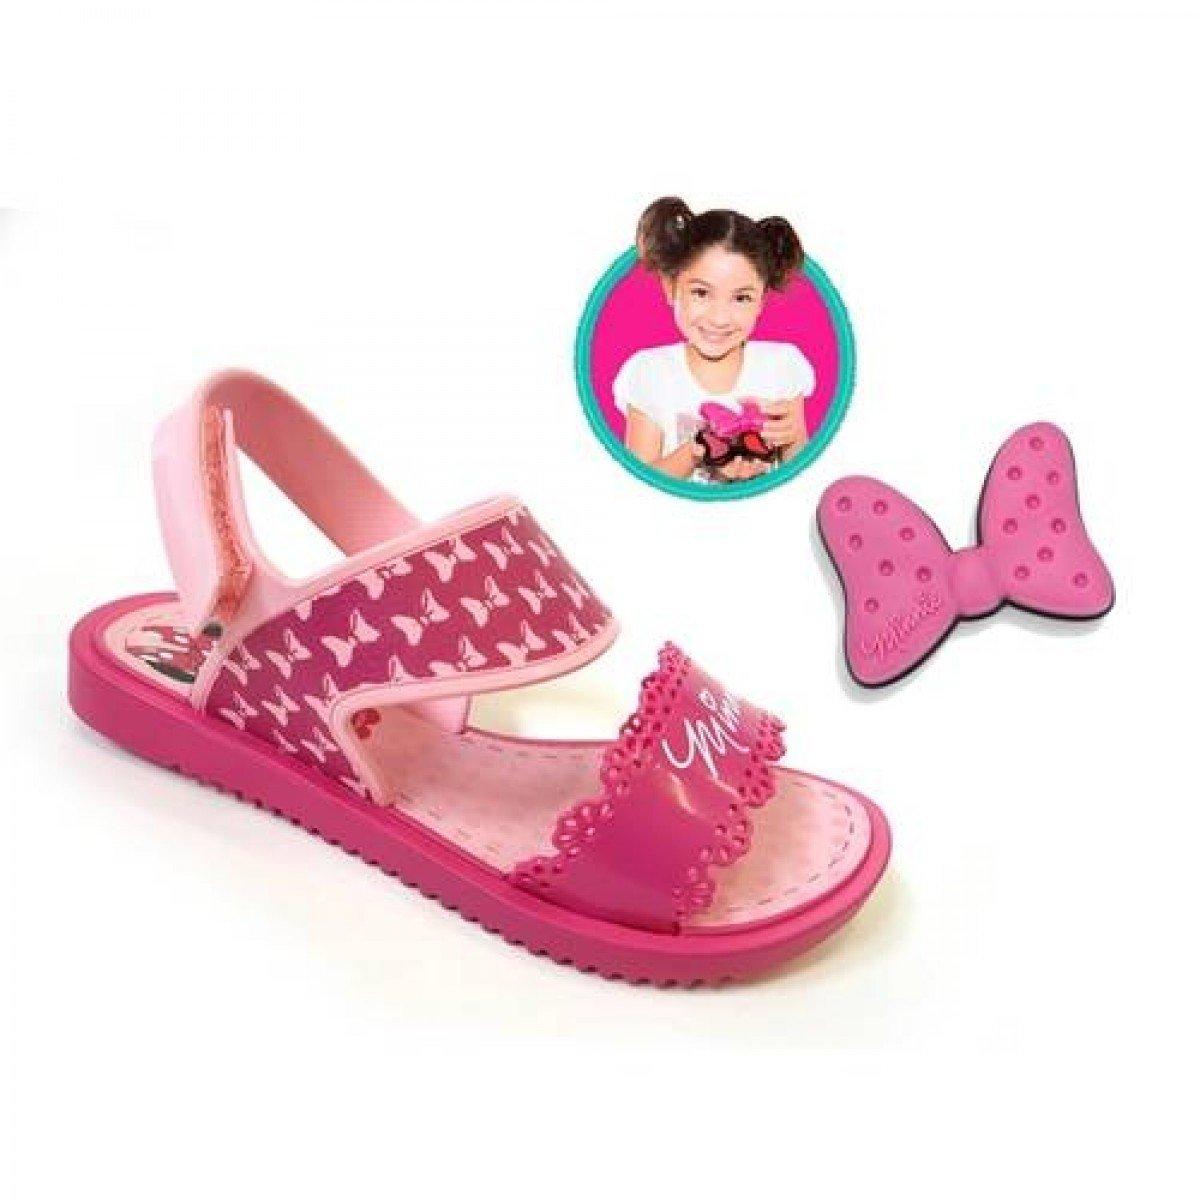 Sandália Grendene Disney Minnie Fashion Maker Infantil - Rosa